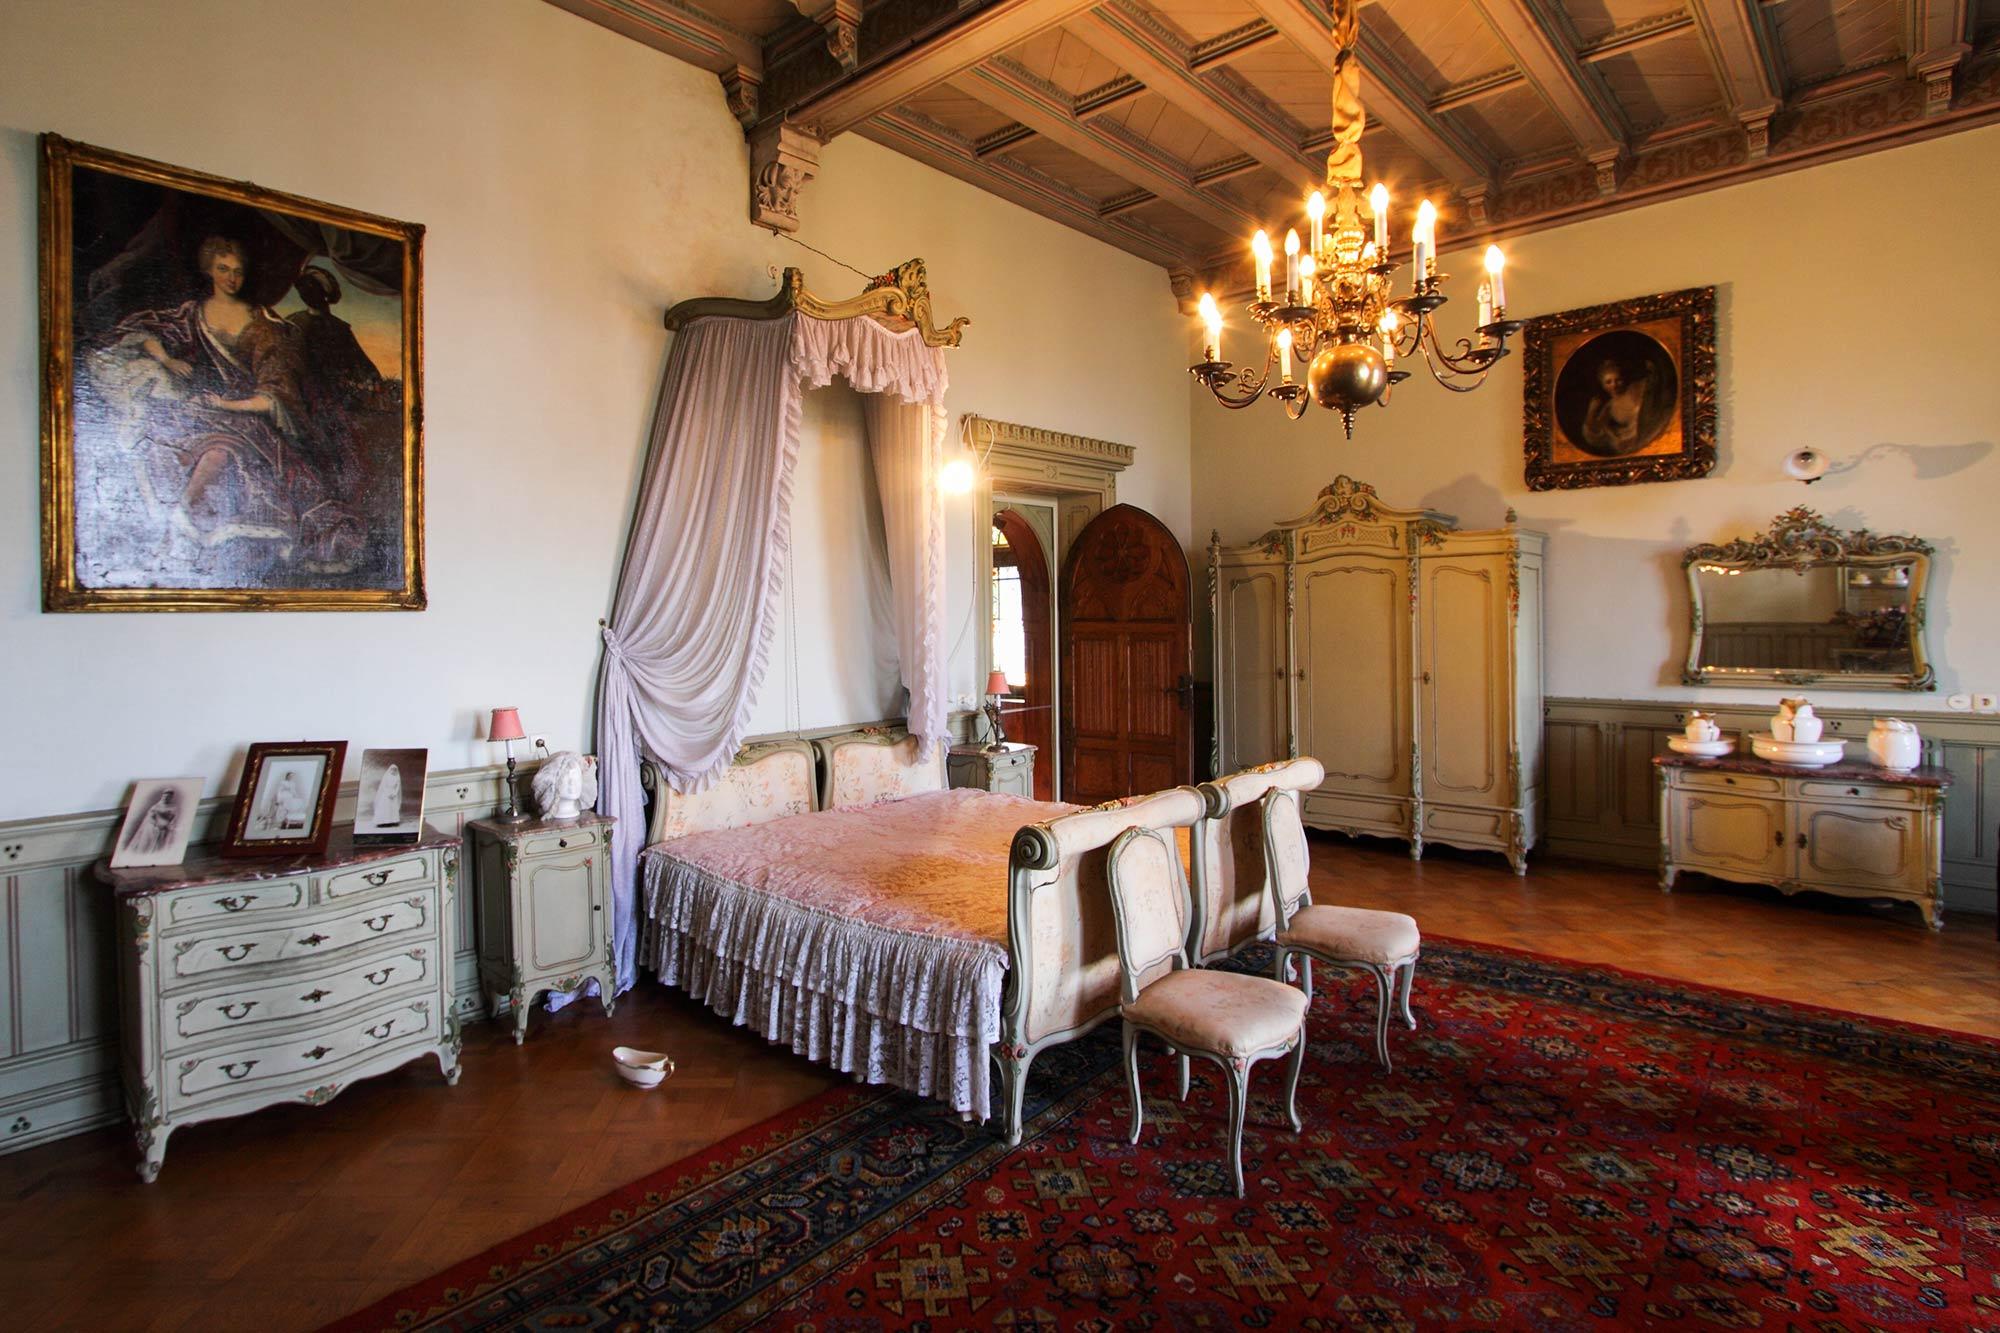 Slaapkamer binnen het kasteel ©Thomas Wallmeyer